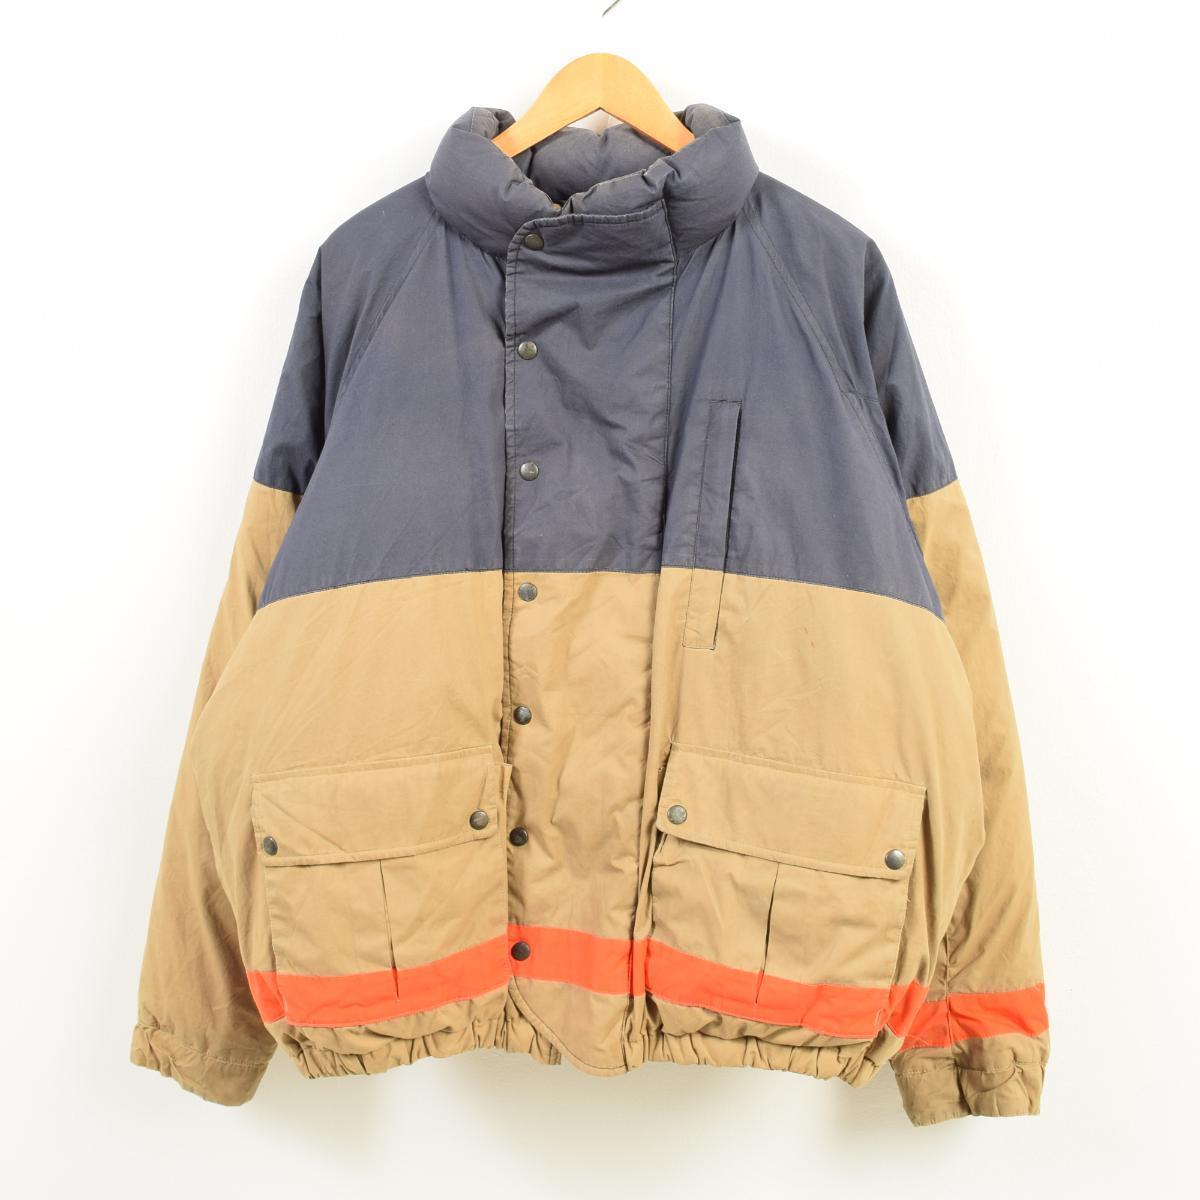 In Men Jacket 80~90 Wax0548 Ralph Xl Down Generation Made Lauren Polo Vintage The Country Singapore PuiOXTlwkZ